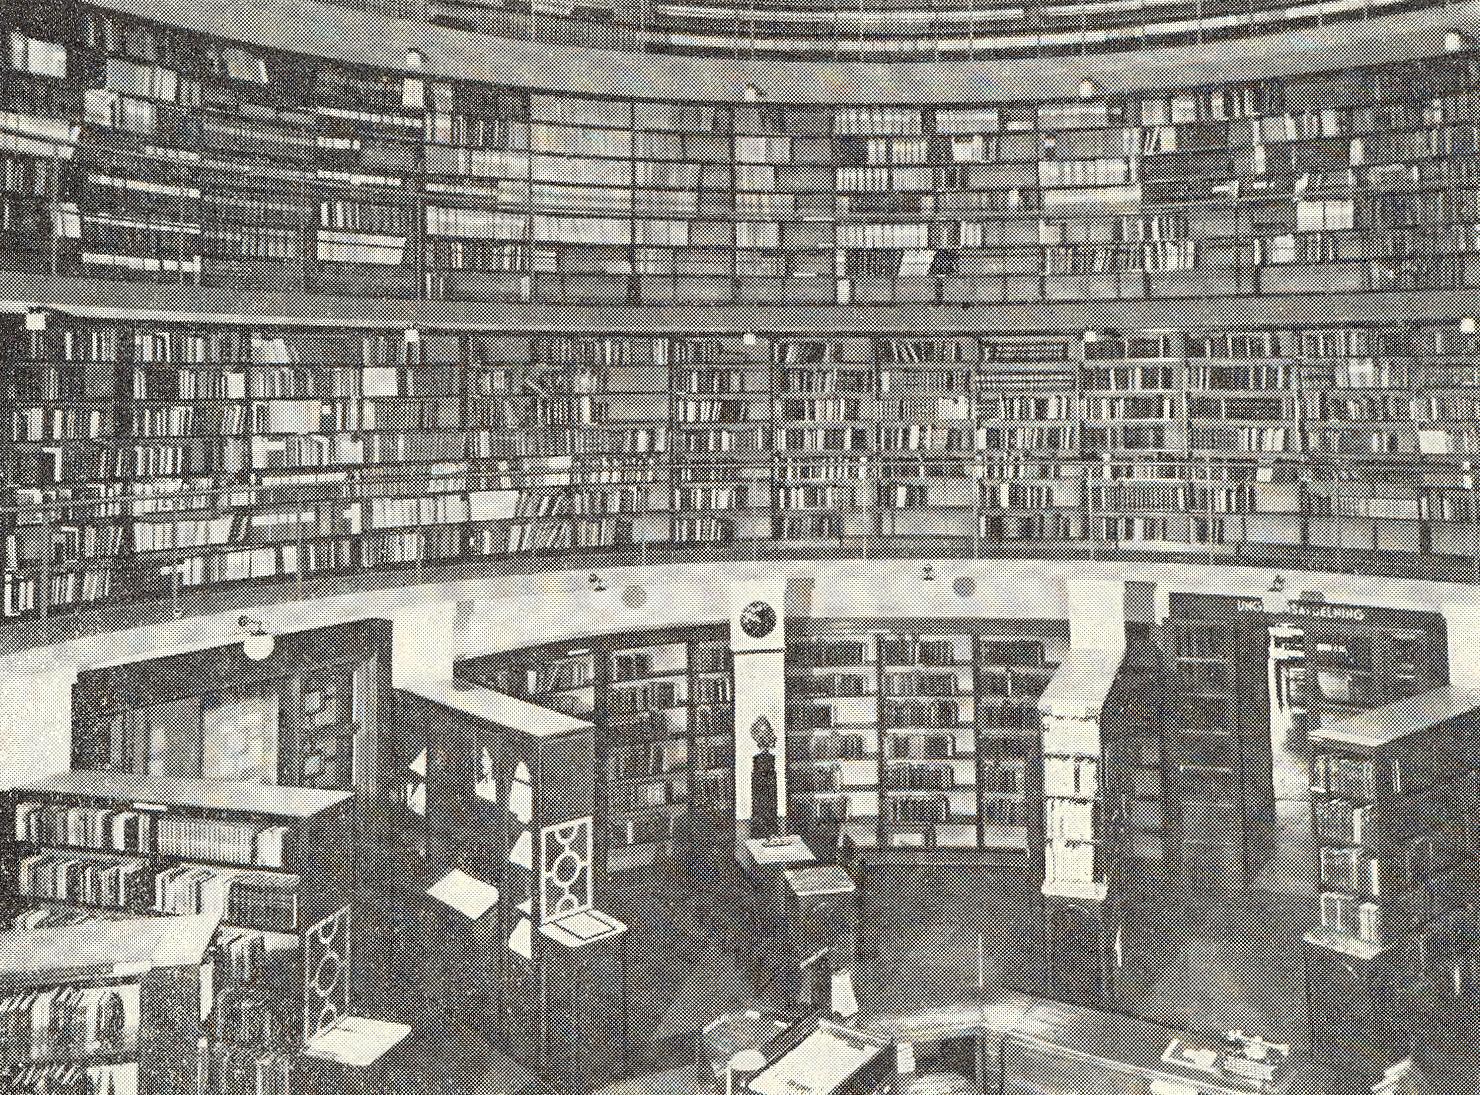 örebro stadsbibliotek